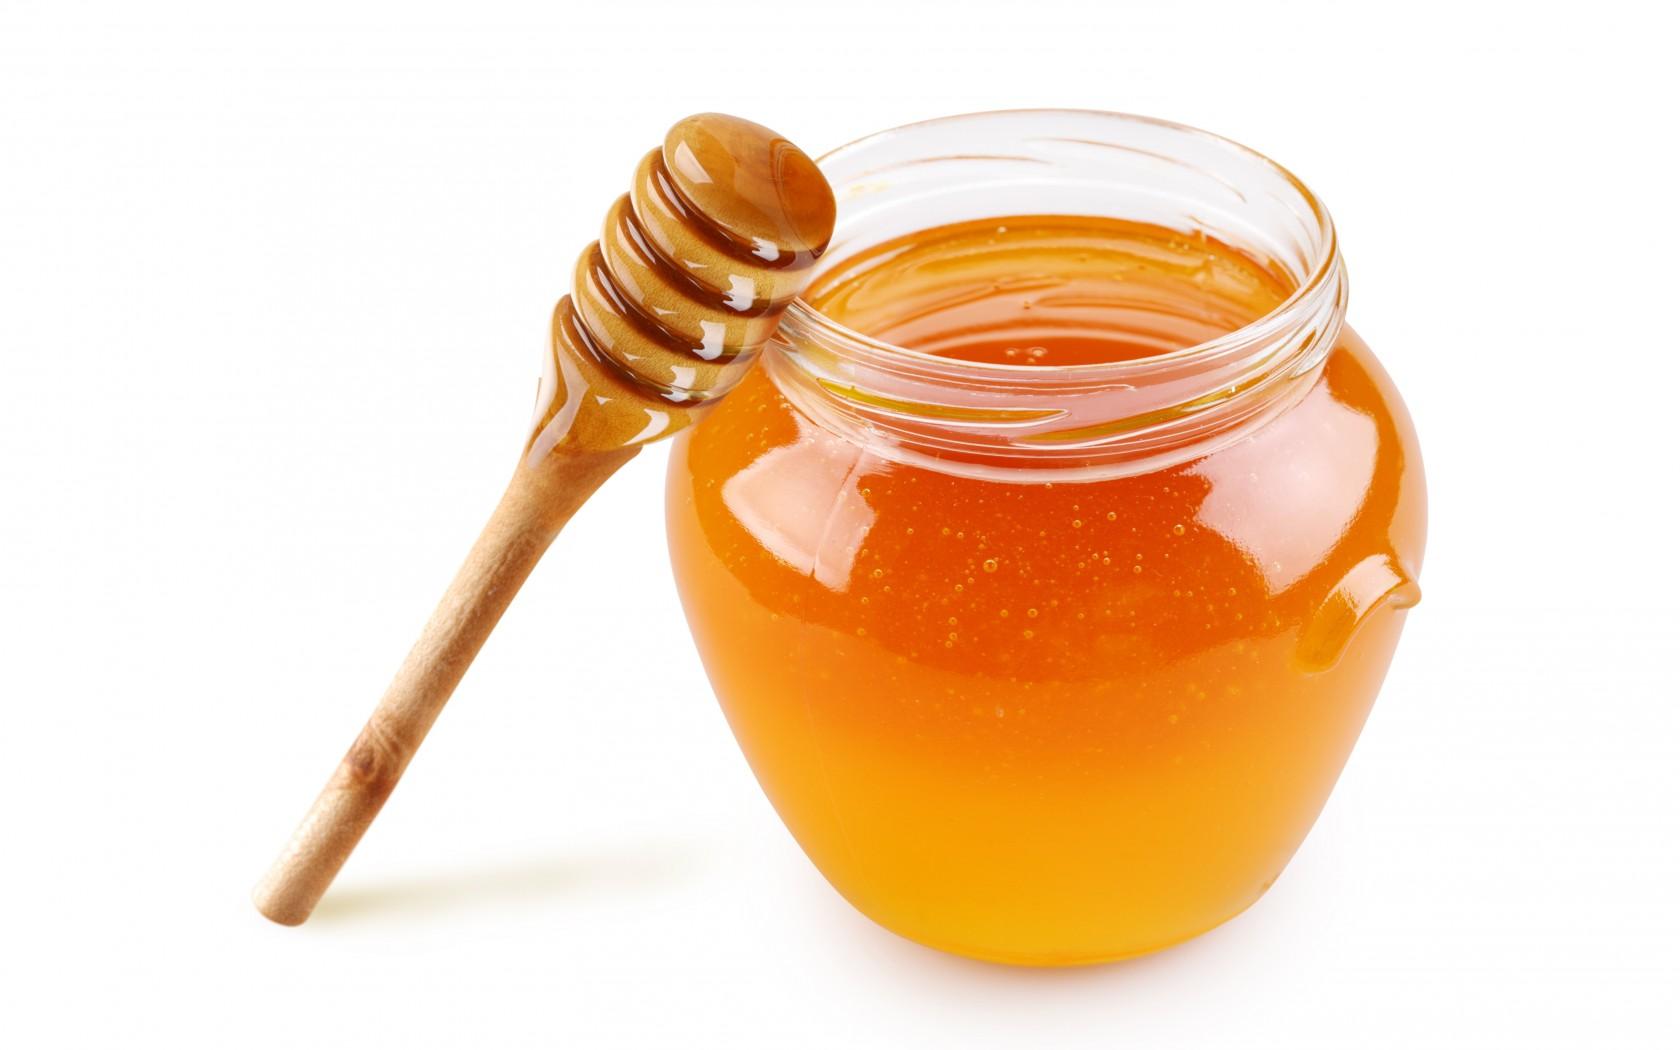 Honey HD wallpapers, Desktop wallpaper - most viewed